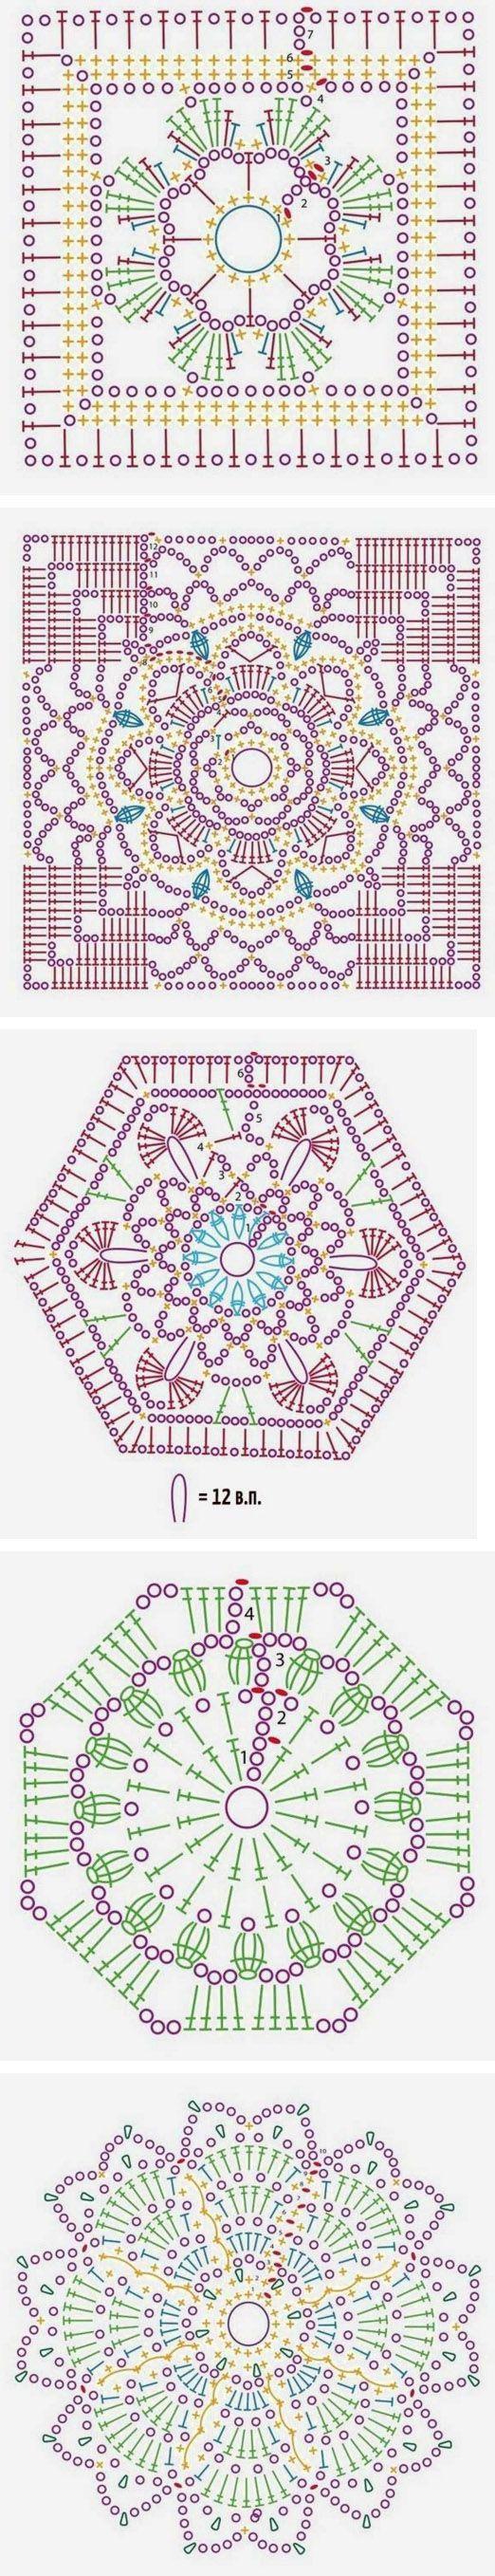 Cute crochet patterns                                                                                                           …   Crochet motif, Crochet motif patterns, Crochet #crochetmotif